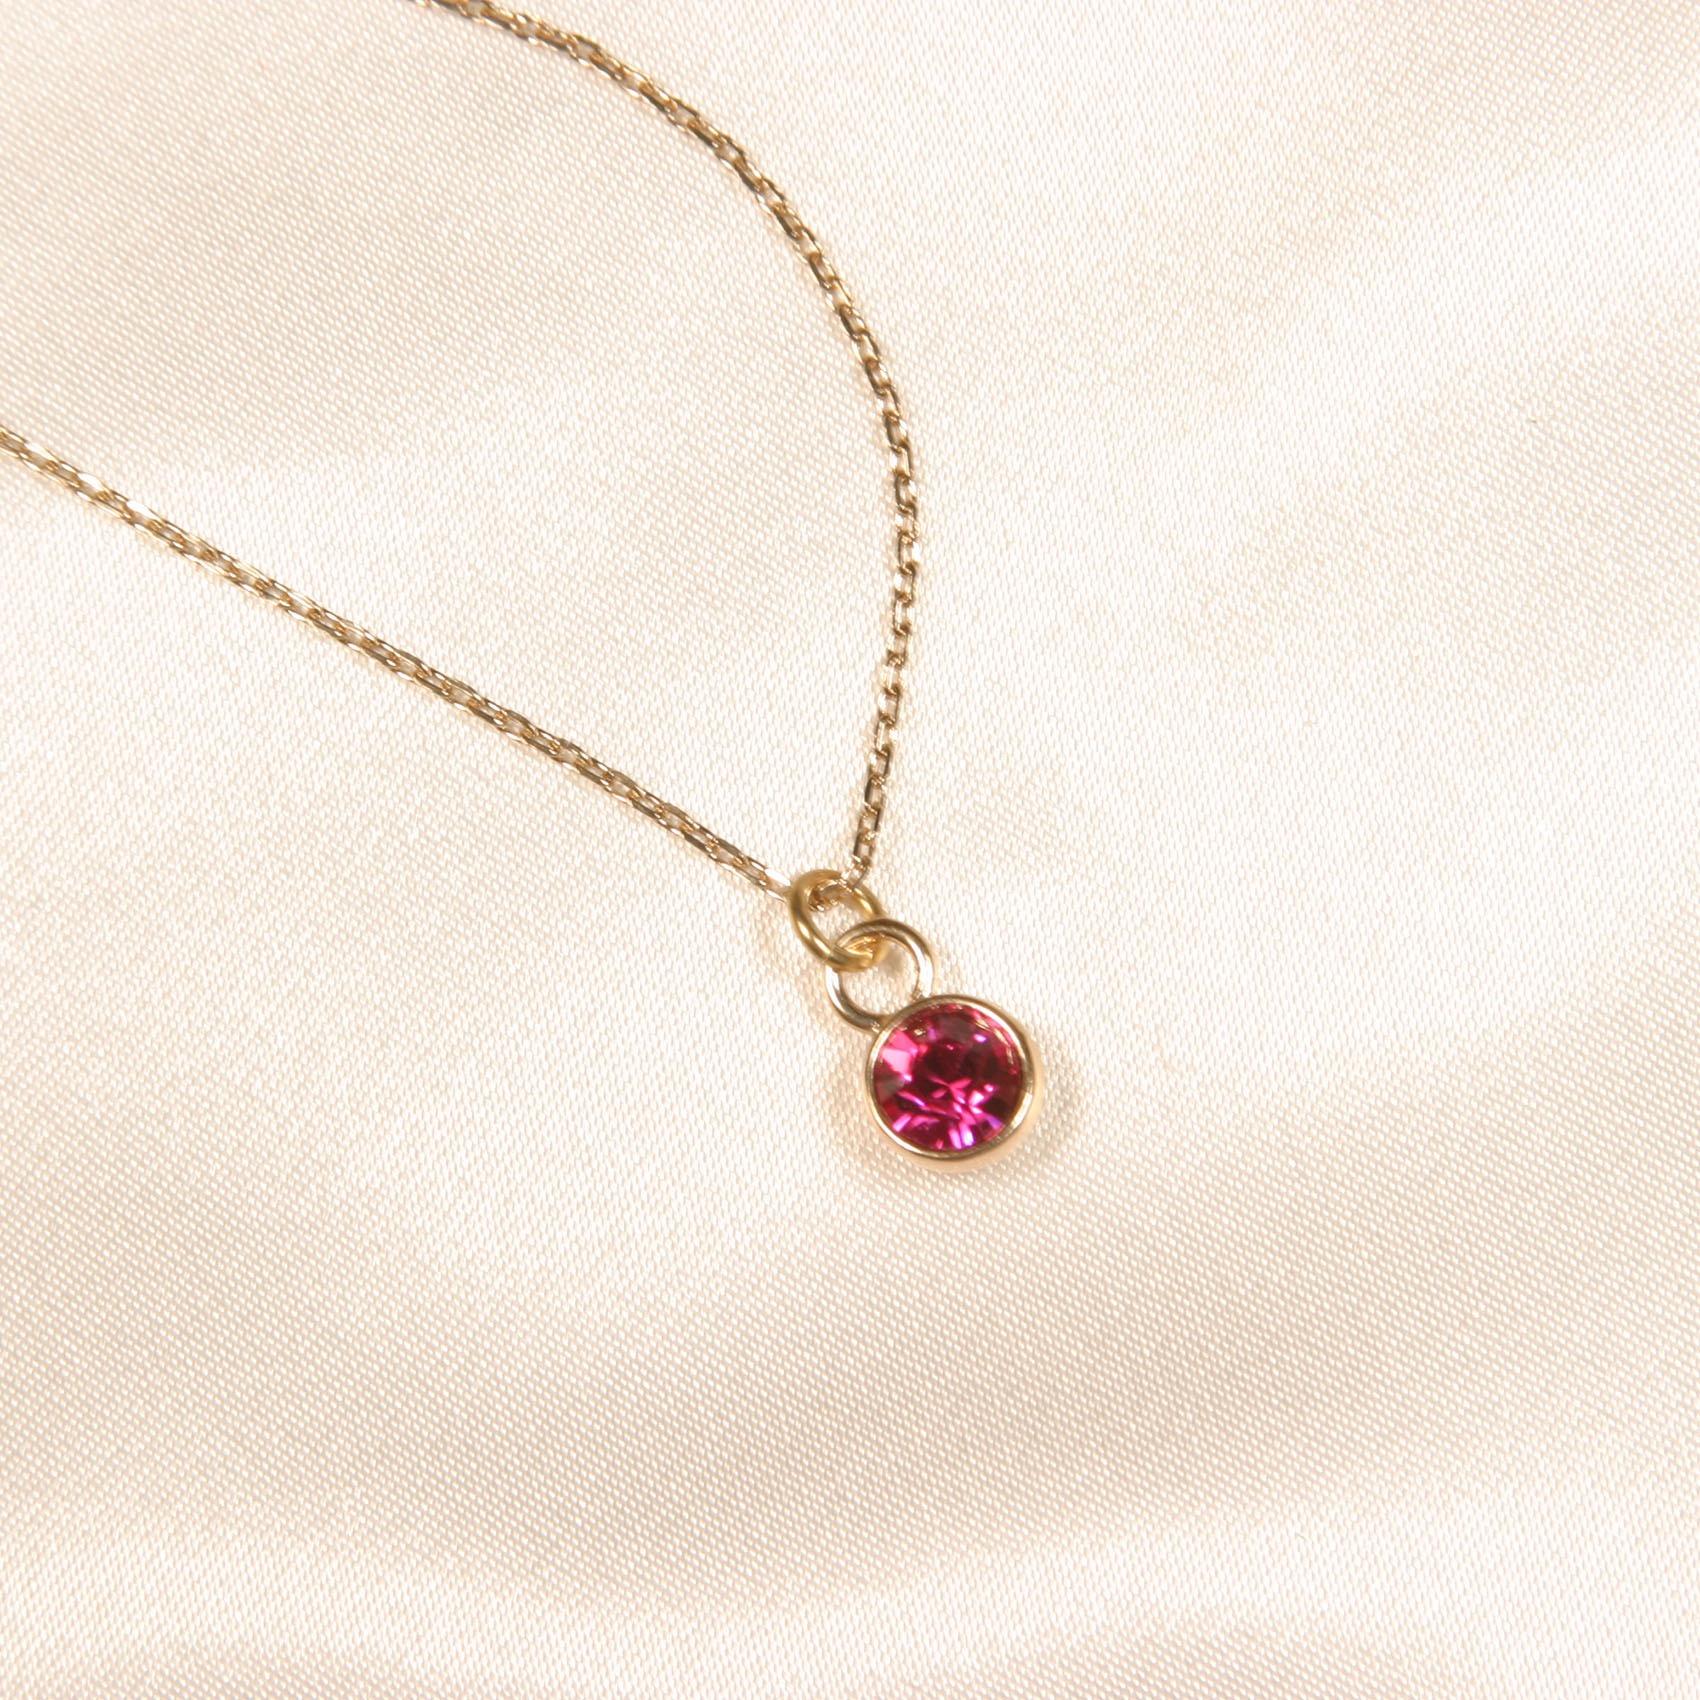 chc22 0 chaine cheville cristal rose.jpg